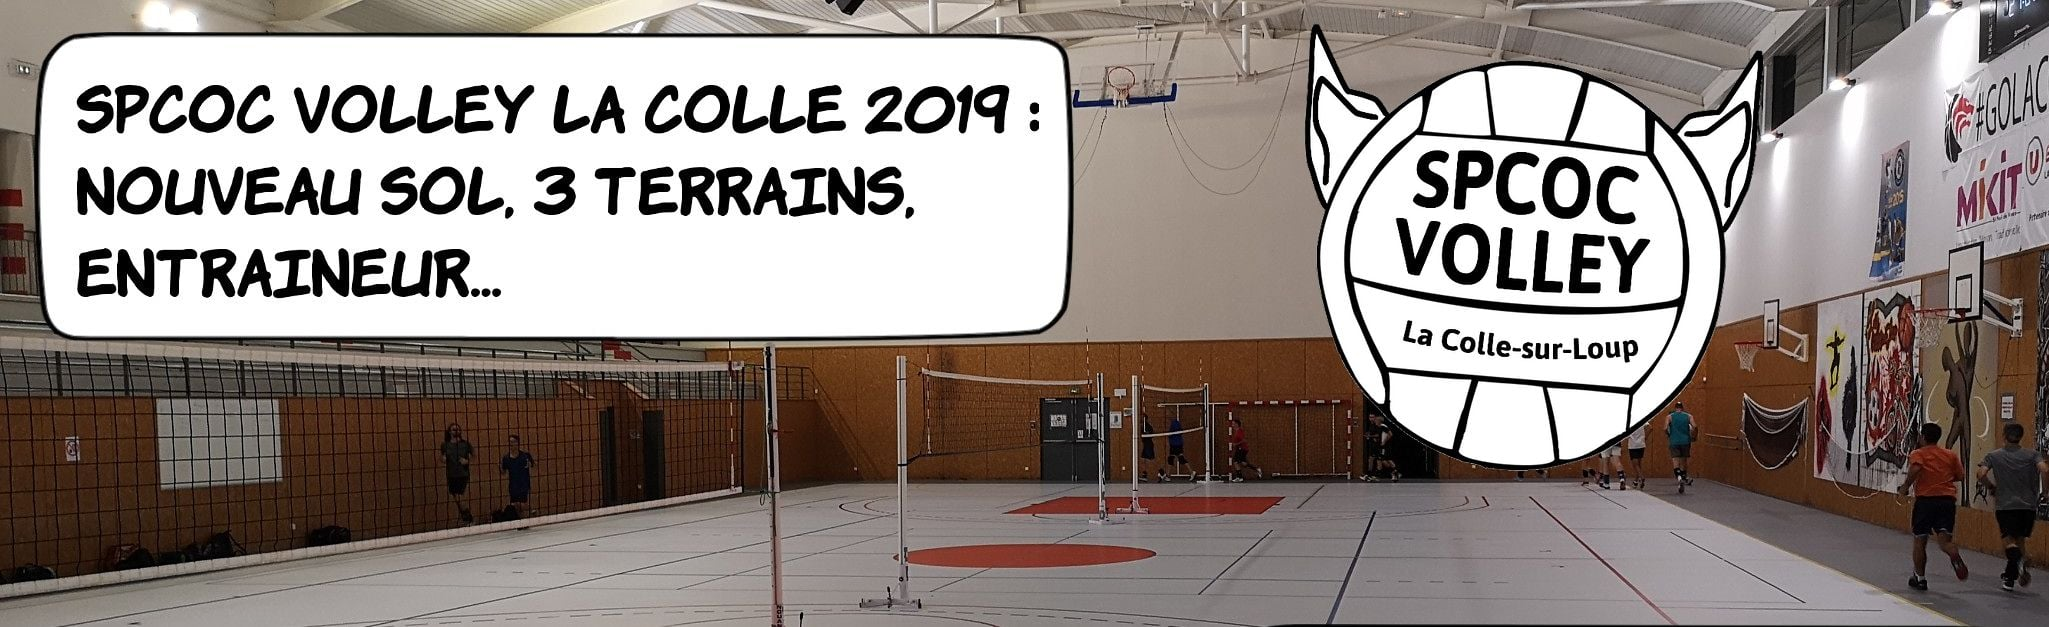 SPCOC VOLLEY - La Colle Saint-Paul